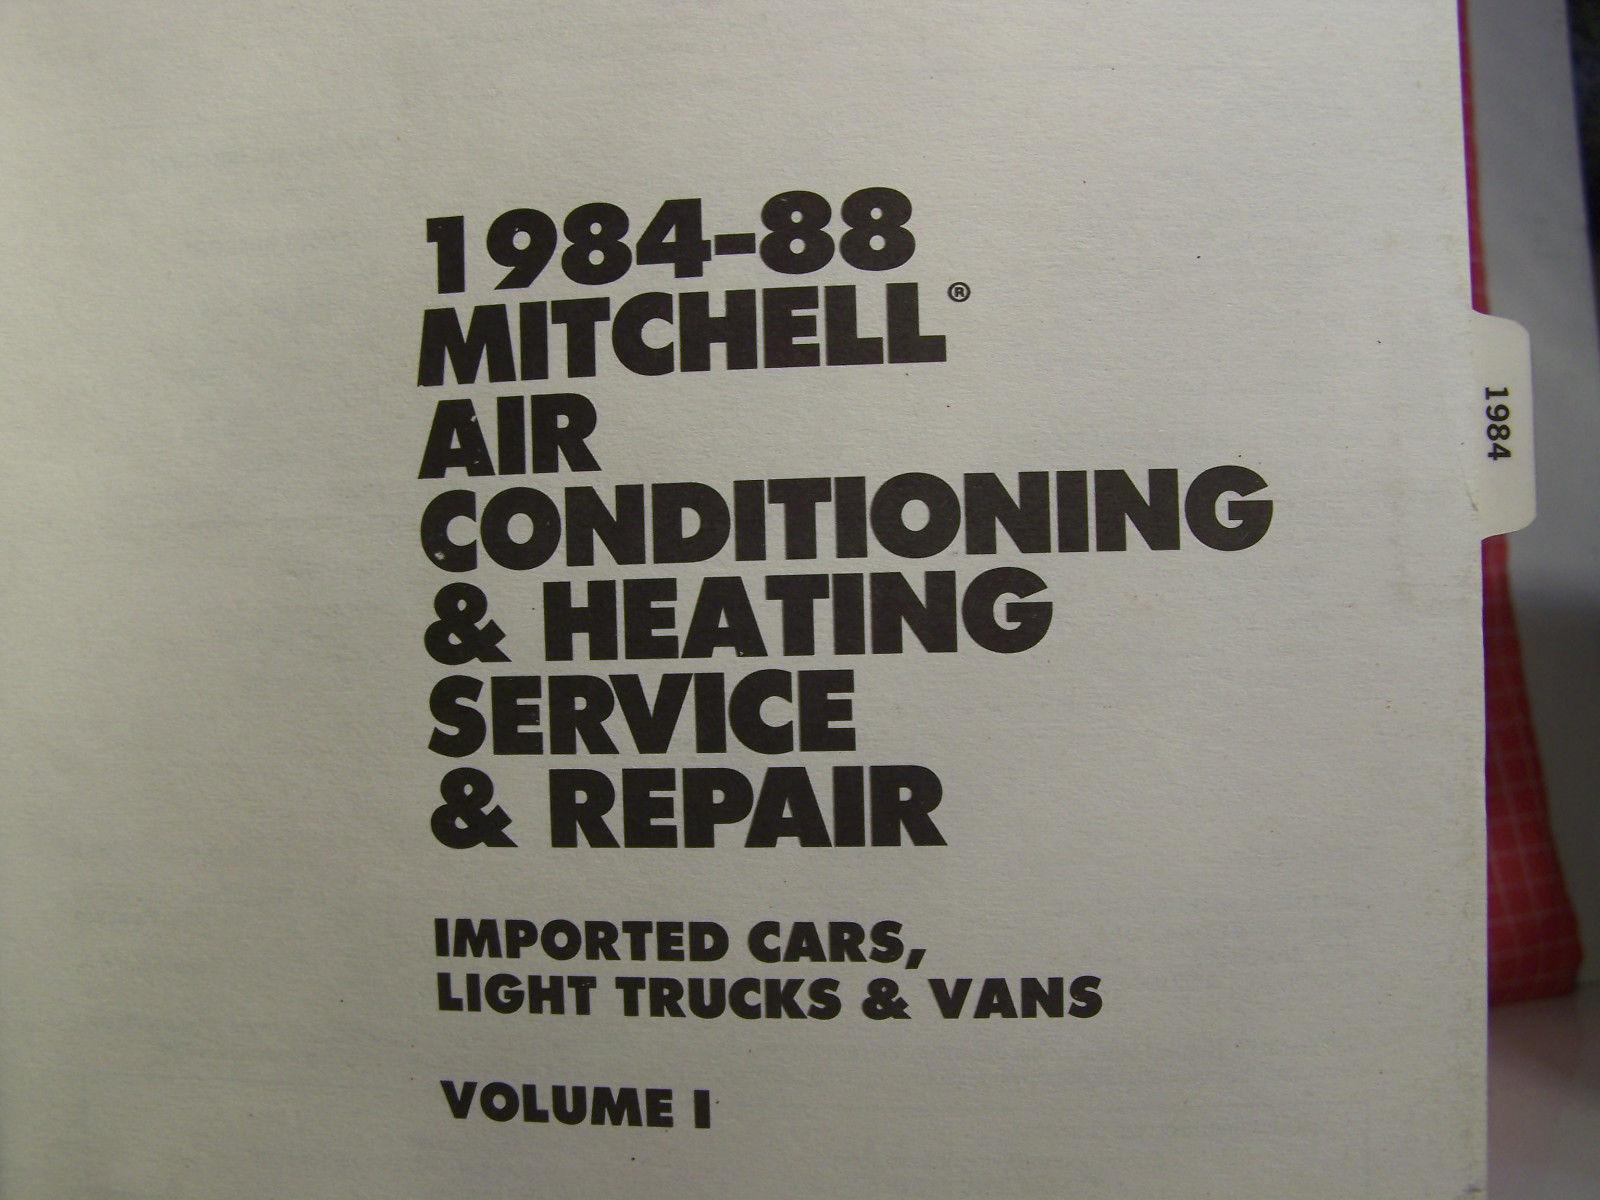 mitchell manual 57 listings rh bonanza com mitchell 1 service manuals mitchell service and repair manuals